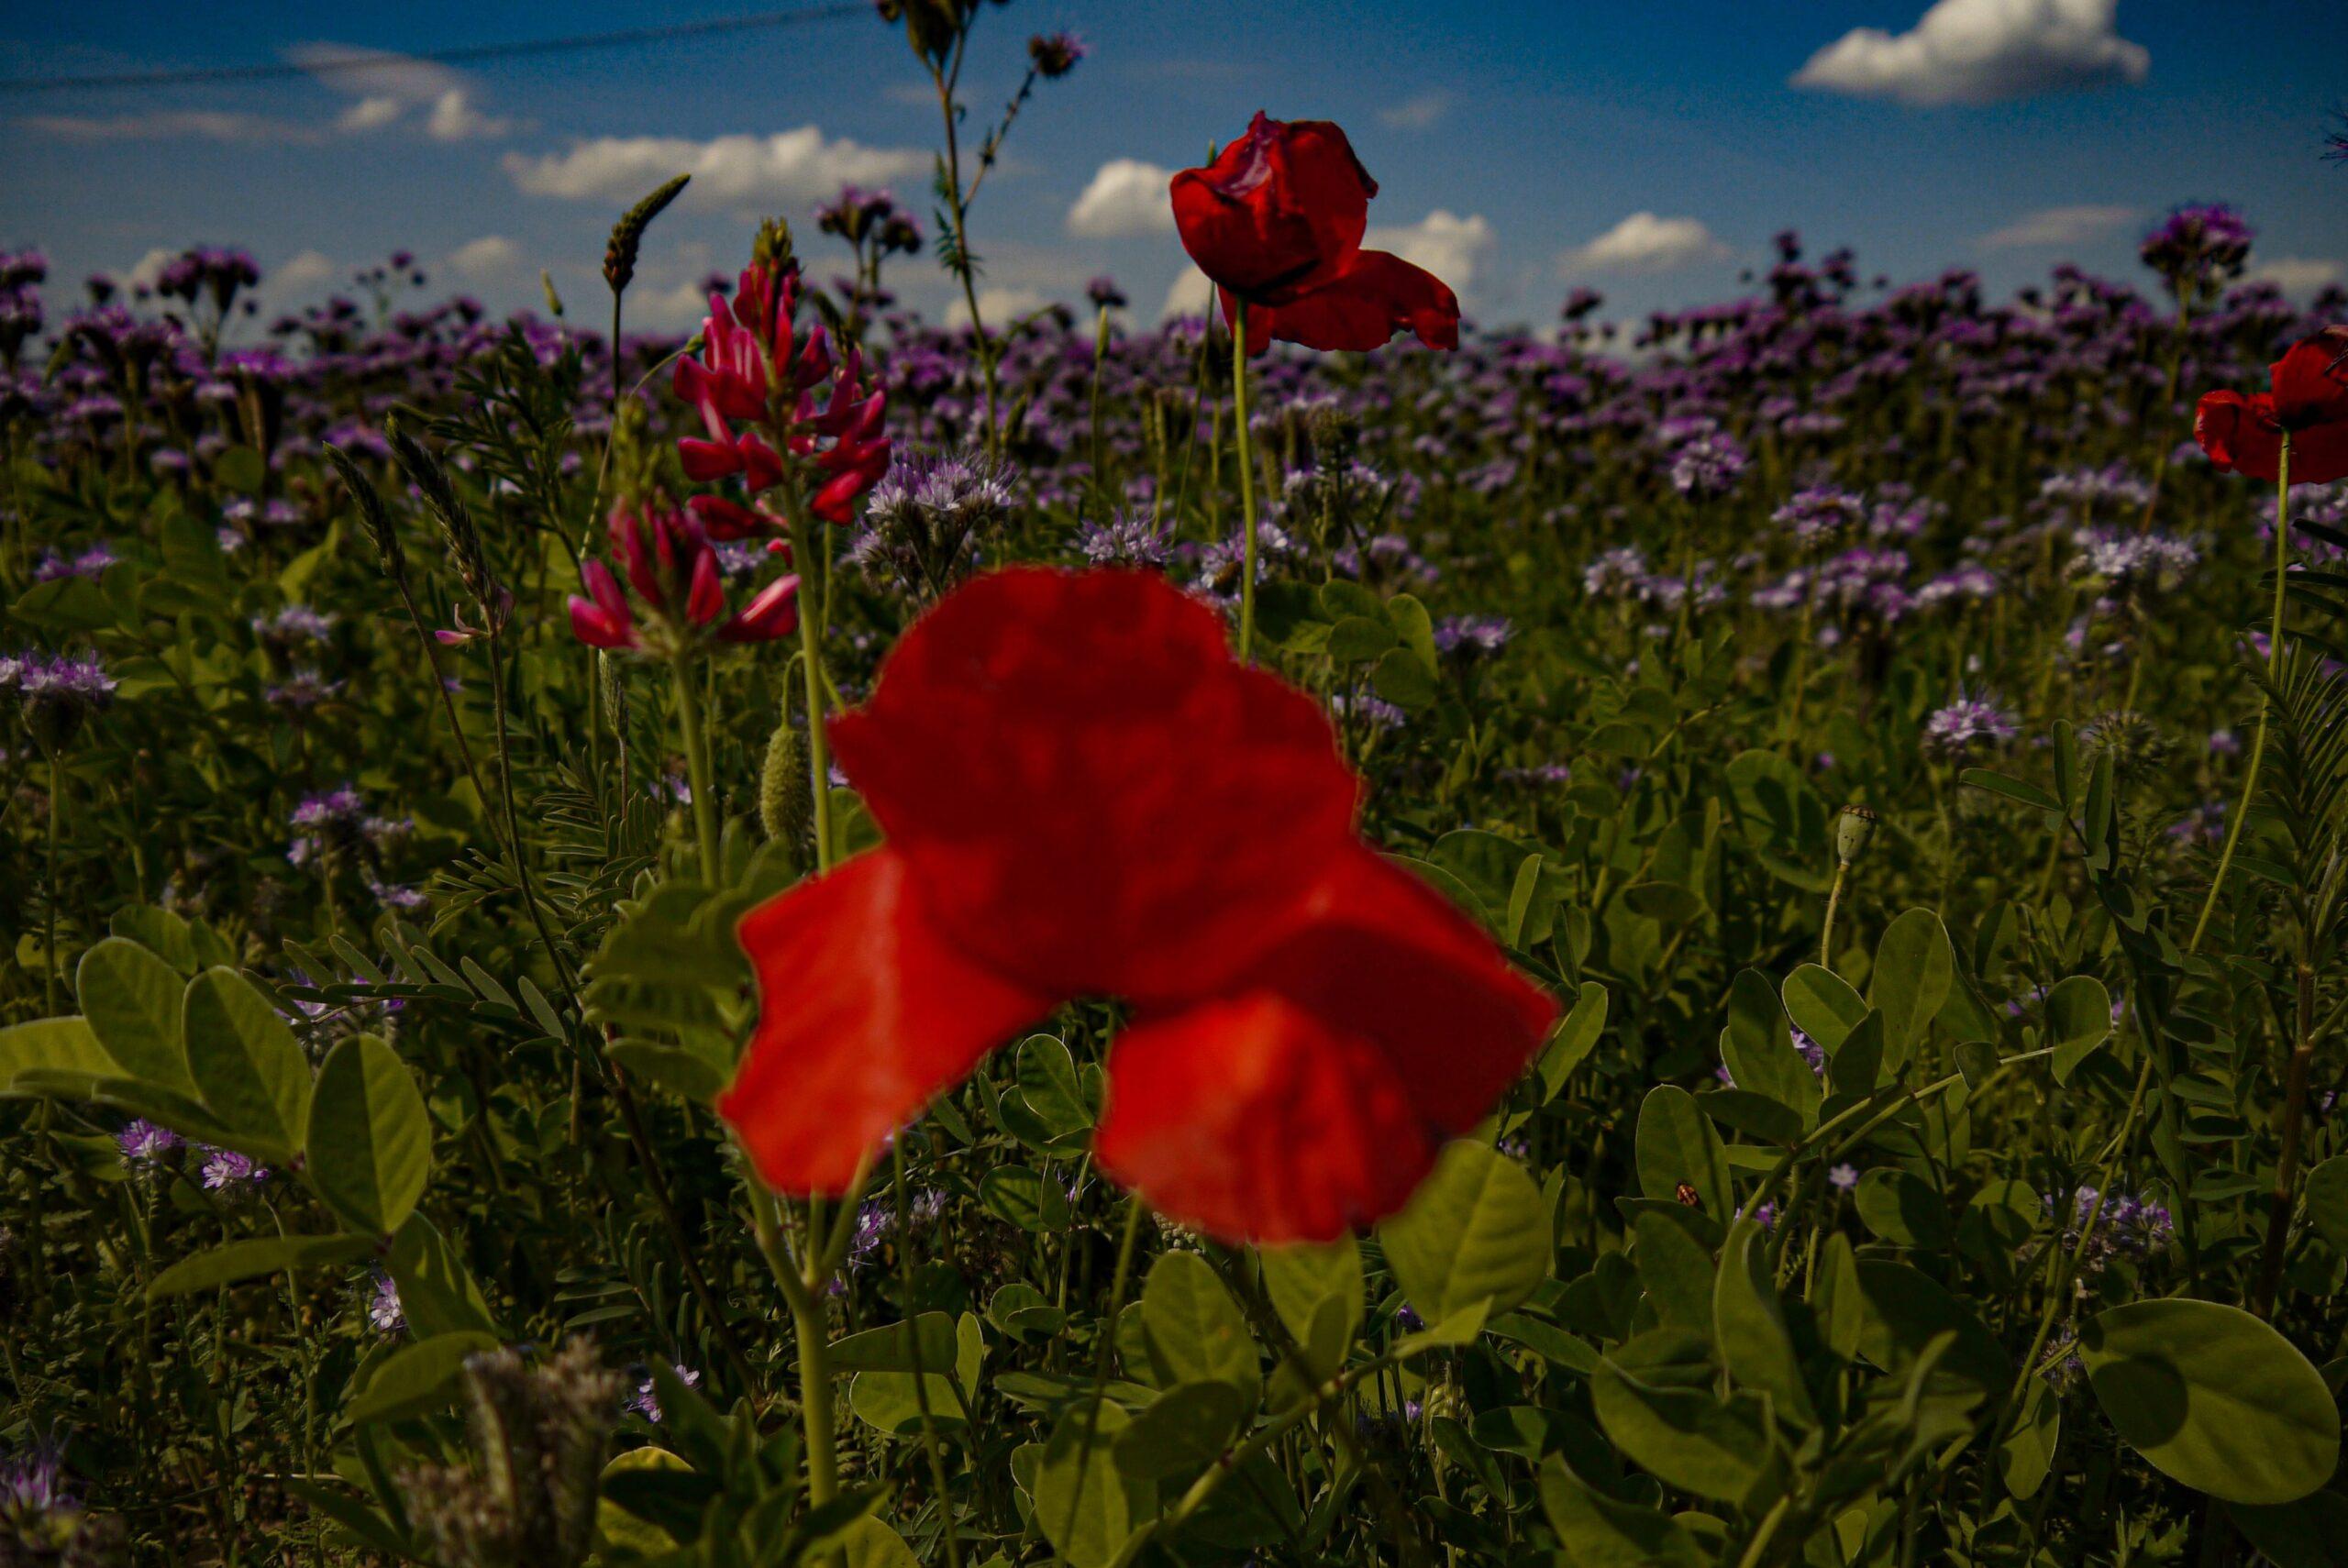 campi di fiori vicino a Modena